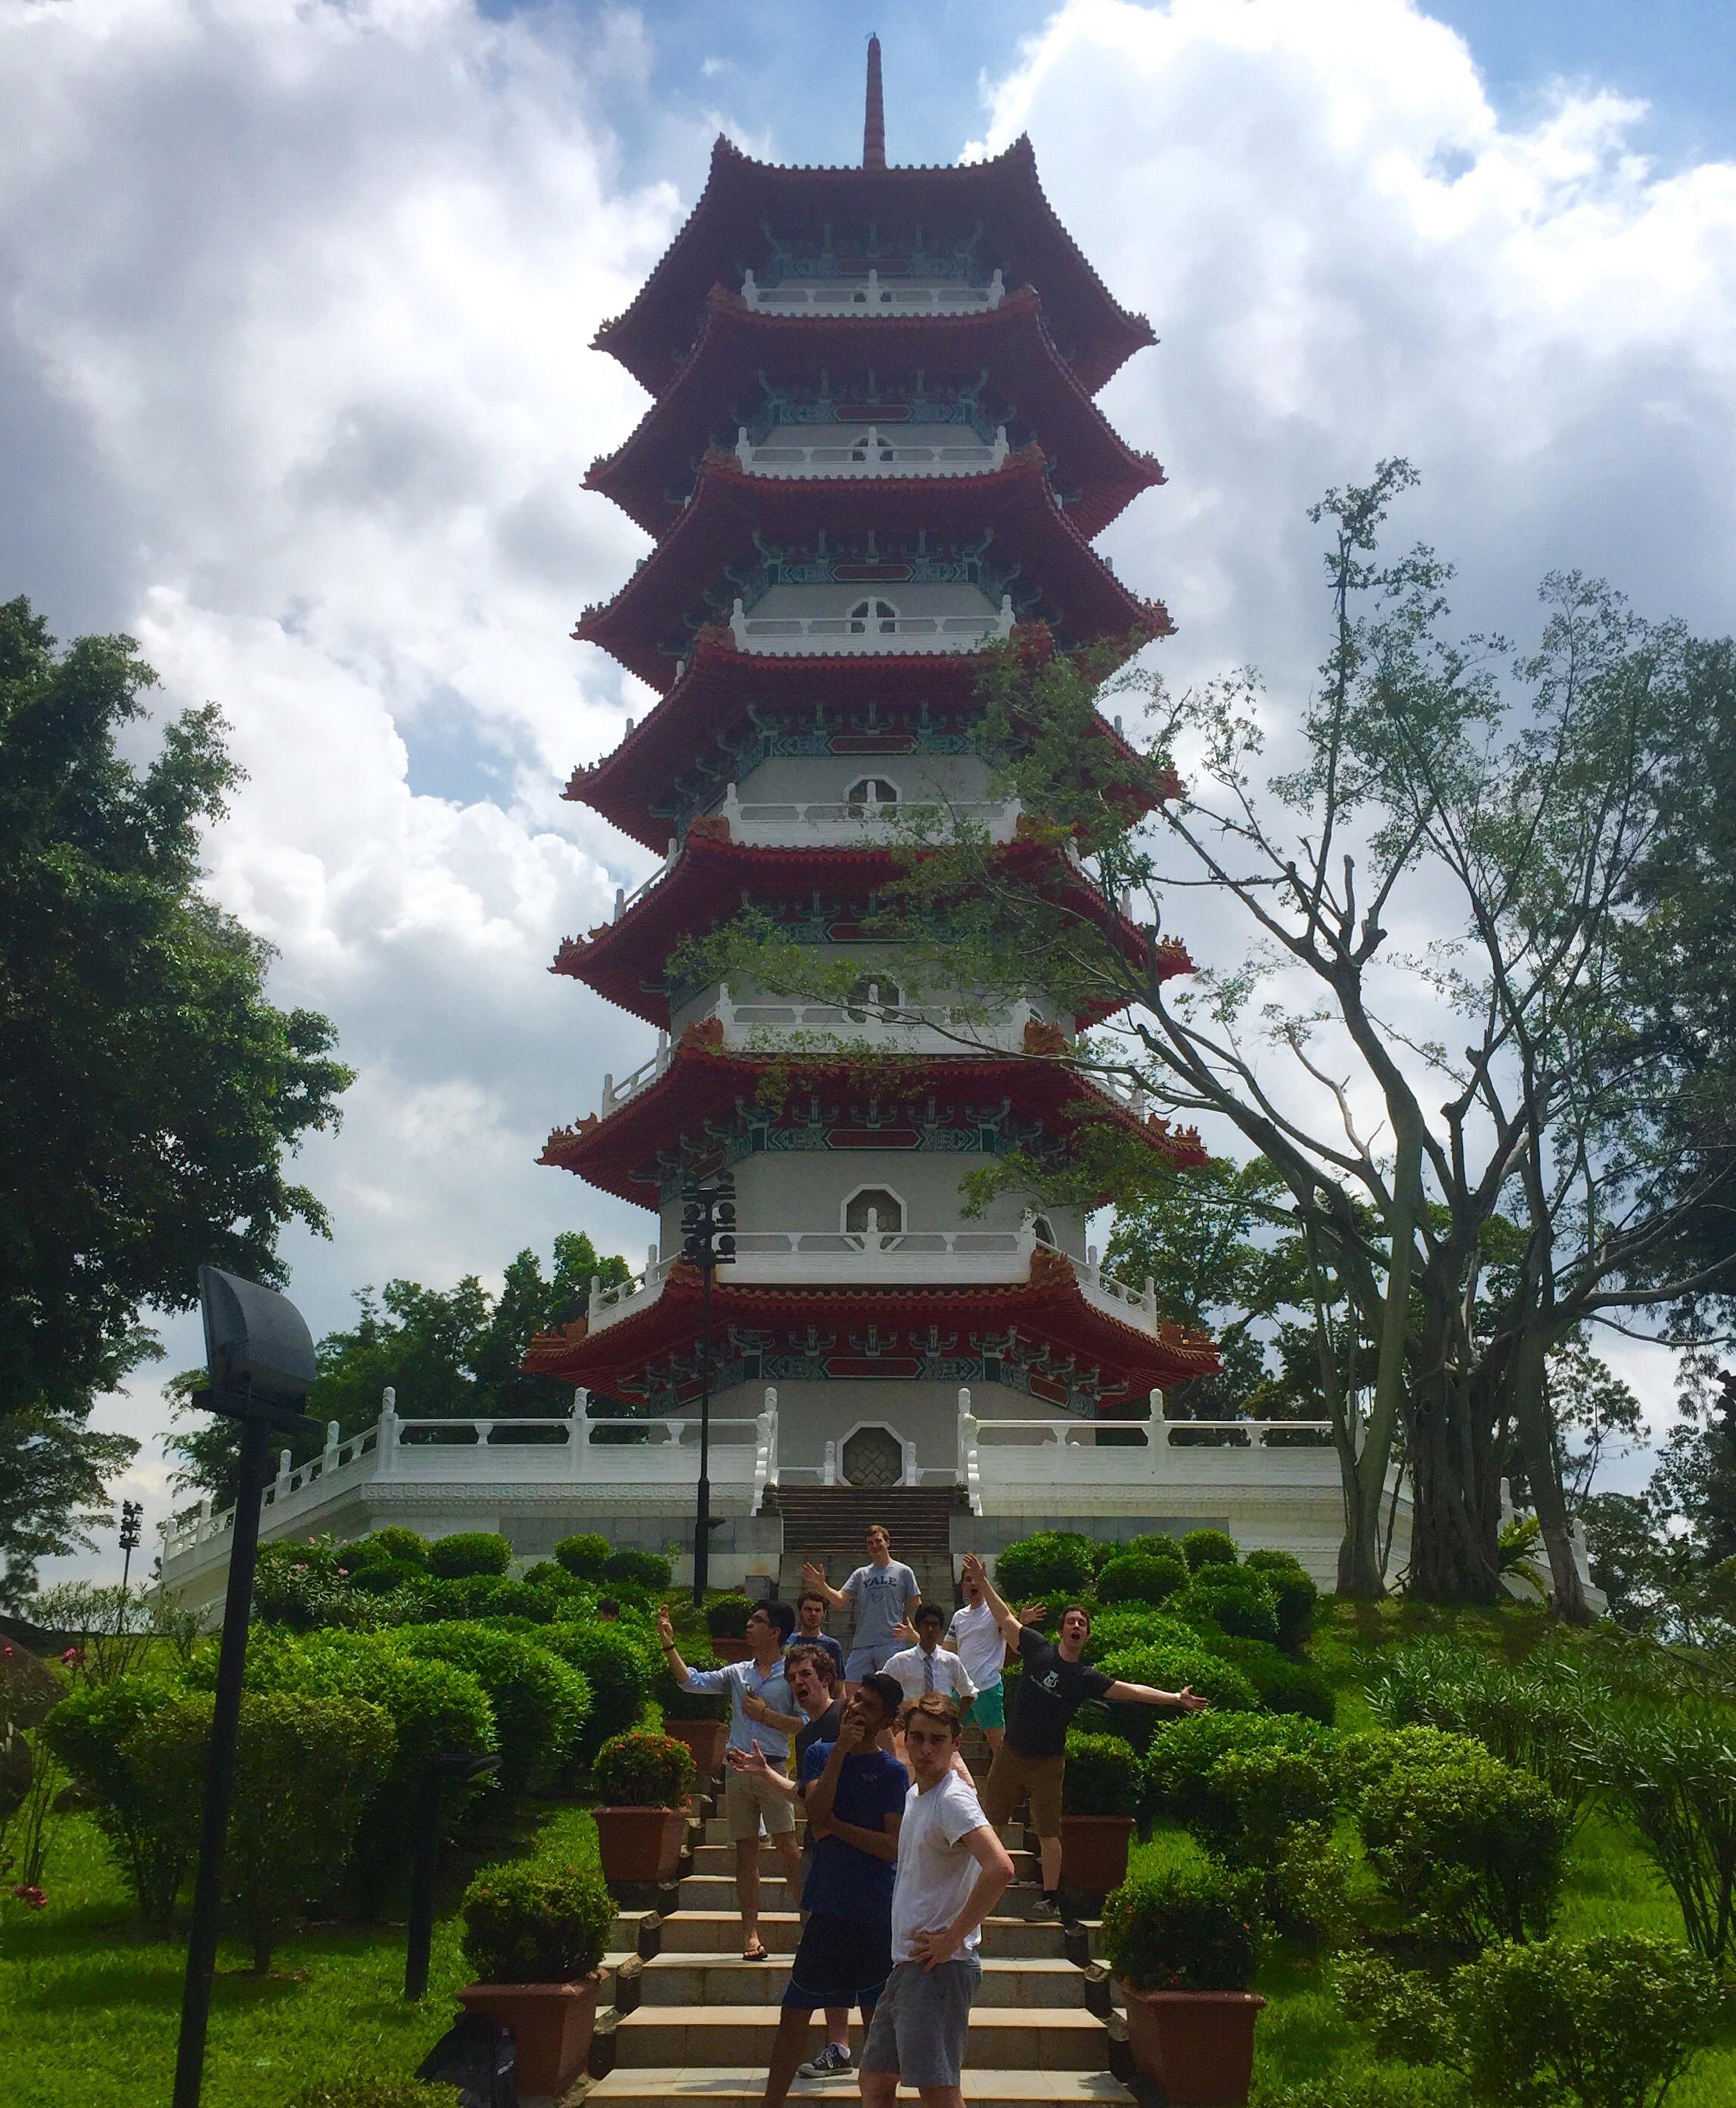 Cats Climb Pagodas: Part I